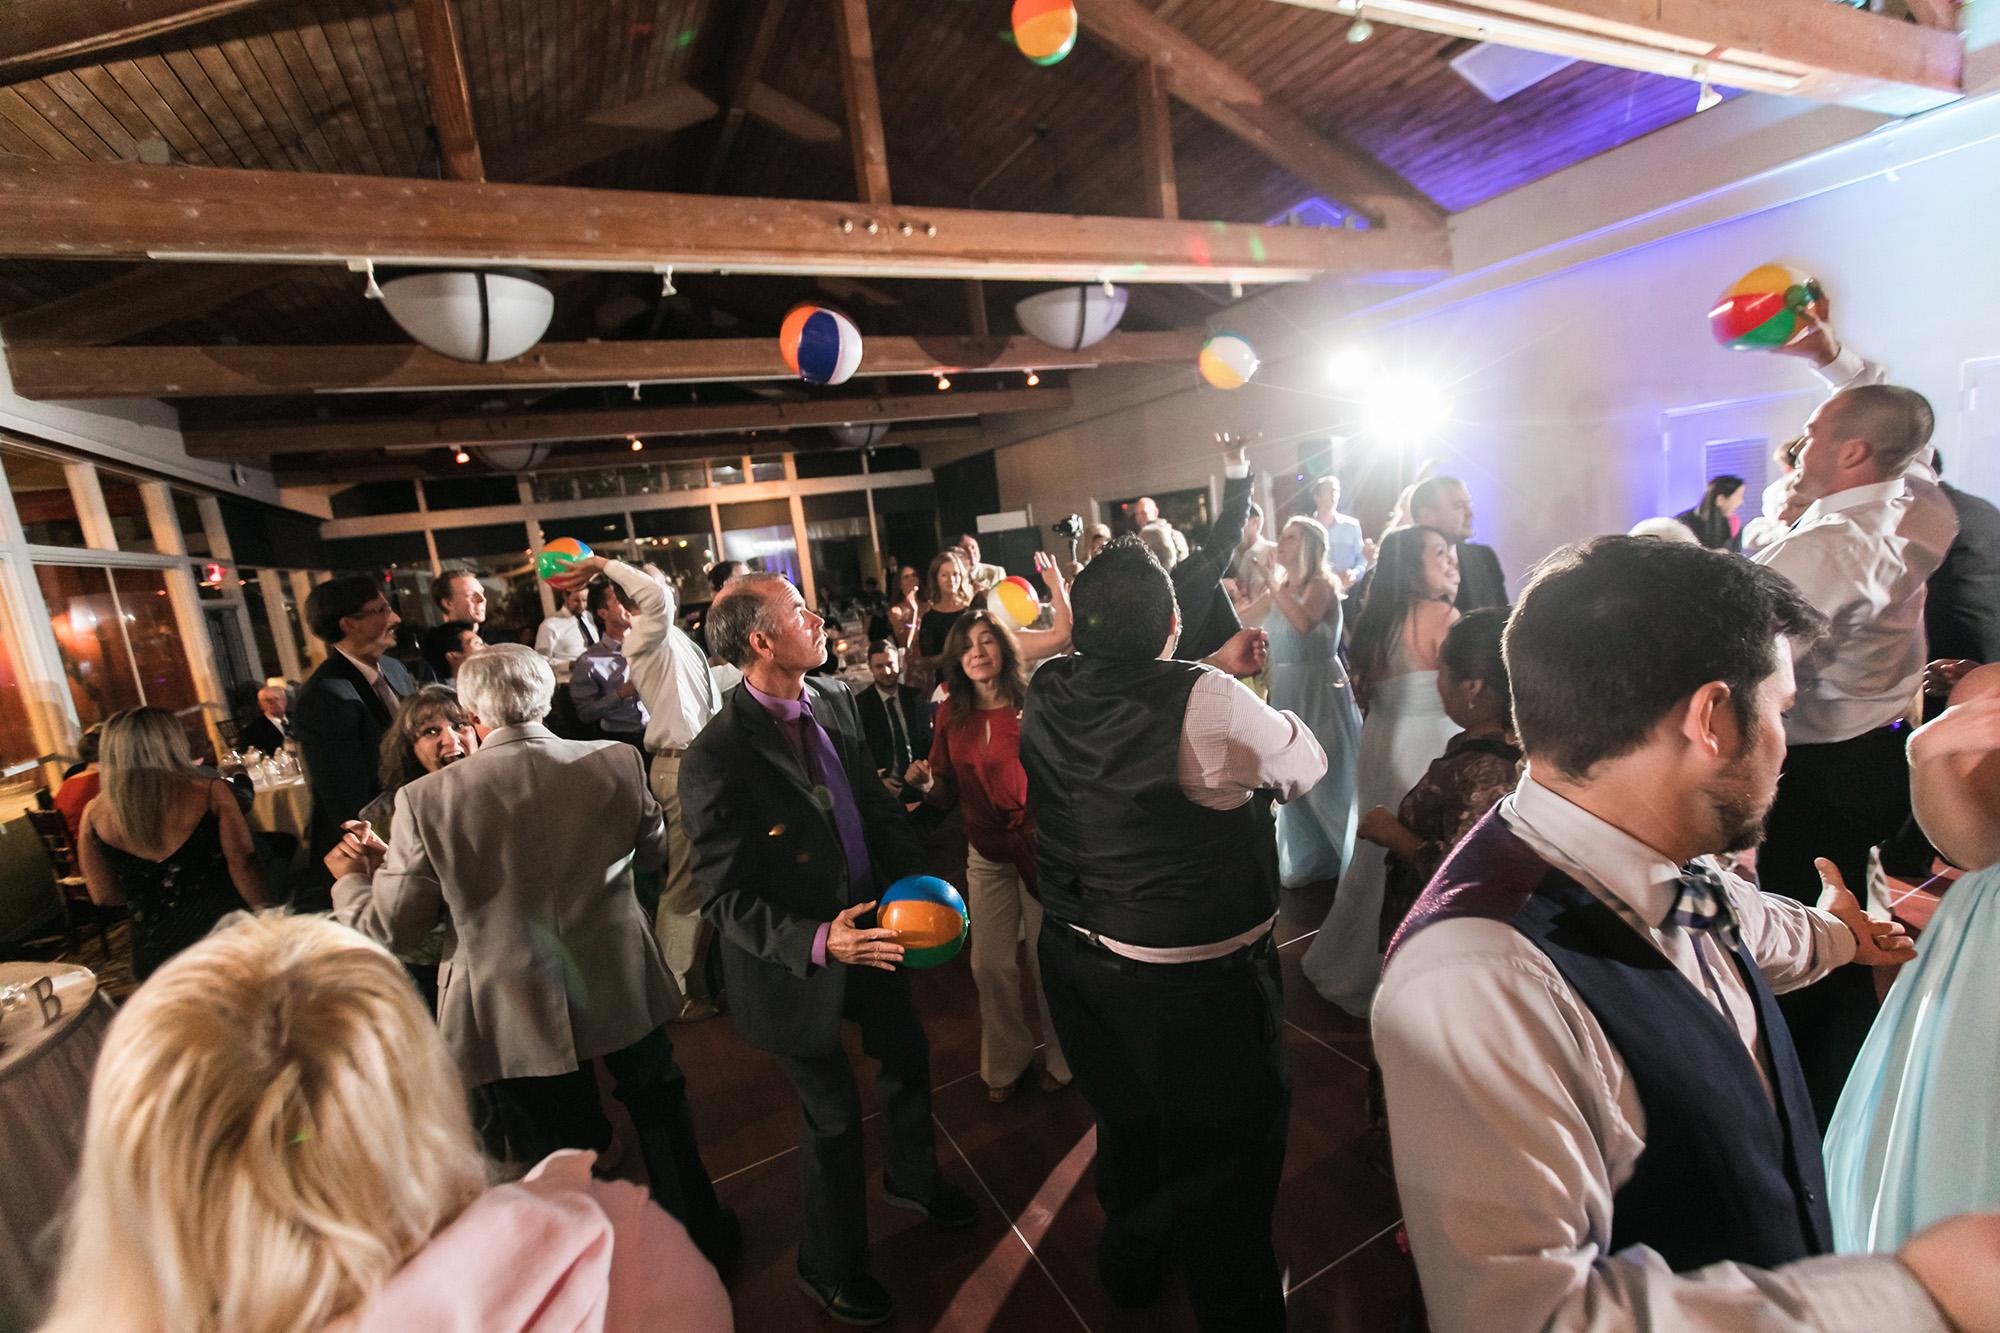 unforgettable-st-monica-wedding-carrie-vines-photography-128.jpg